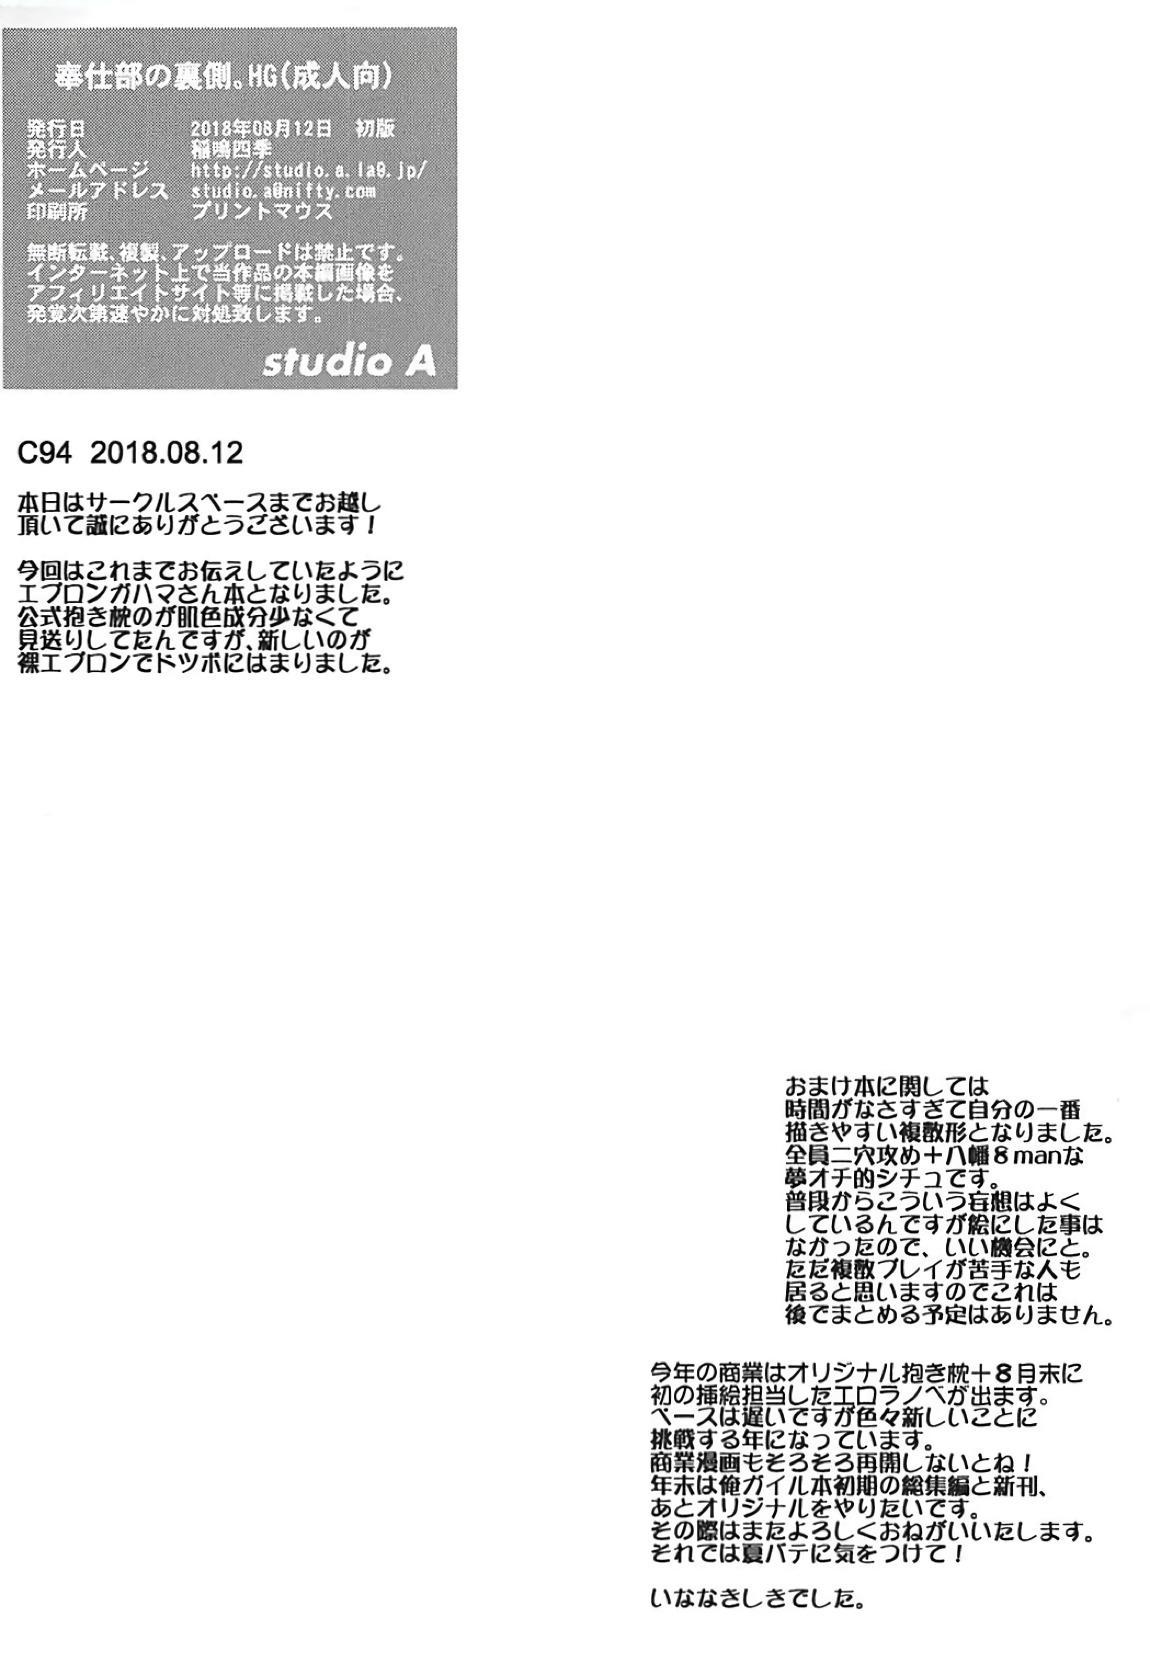 Houshi-bu no Uragawa. HG | The Hidden Side of the Service Club HG 7